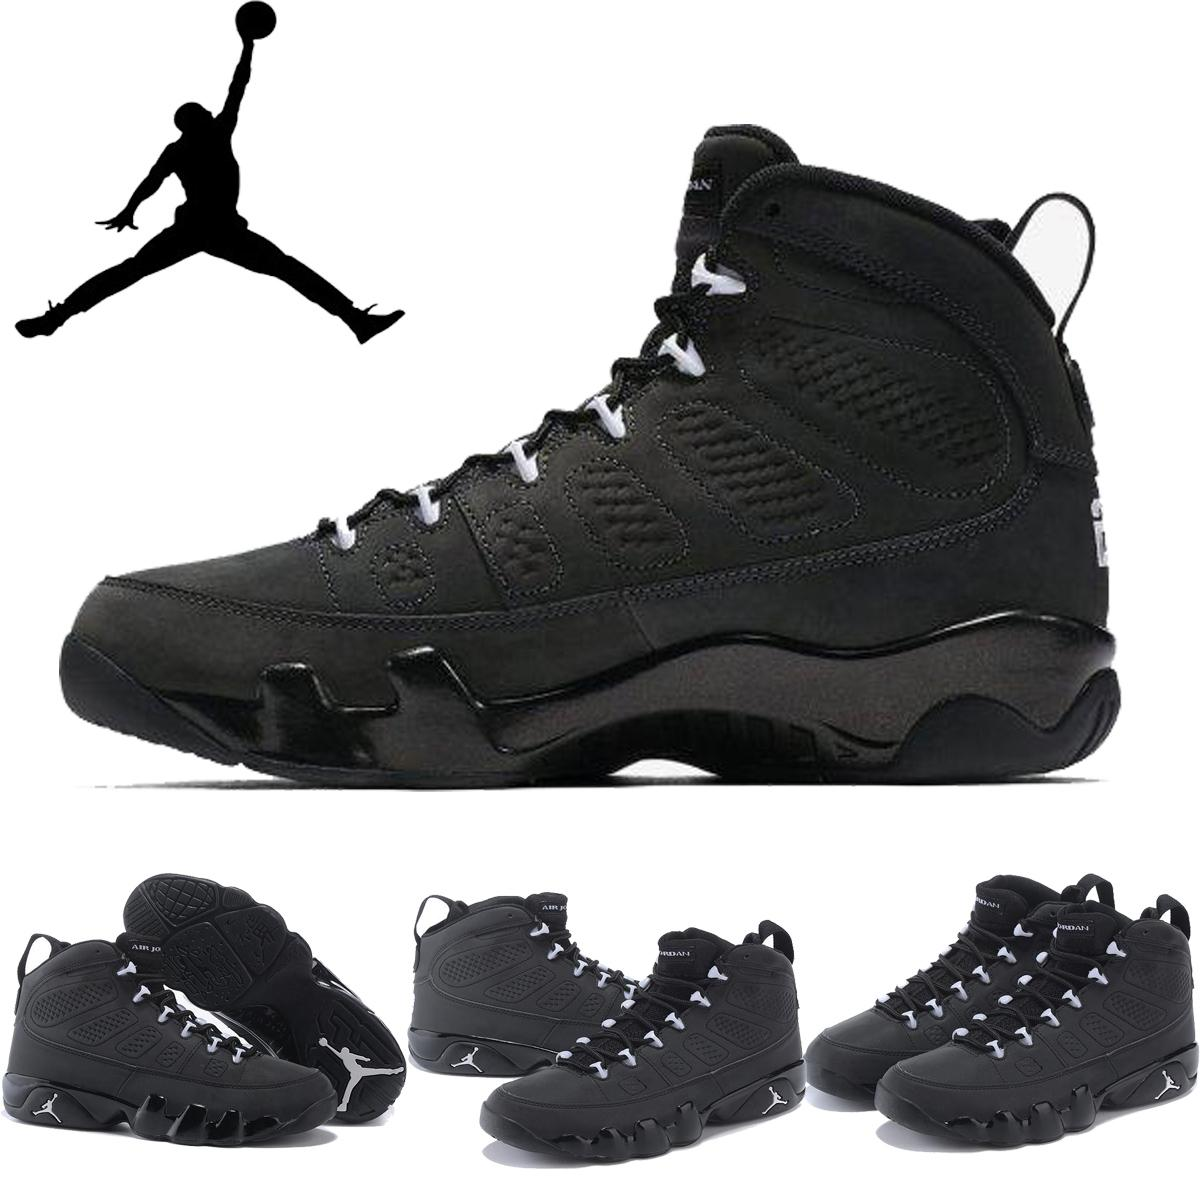 quality design 4a5fd 16865 Großhandel Nike Air Jordan 9 Retro Anthrazit Weiß Schwarz Frauen Der Männer  Basketball Schuhe, Original AJ9 Retro Ix J9s Für Männer Turnschuhe  Sportschuhe ...